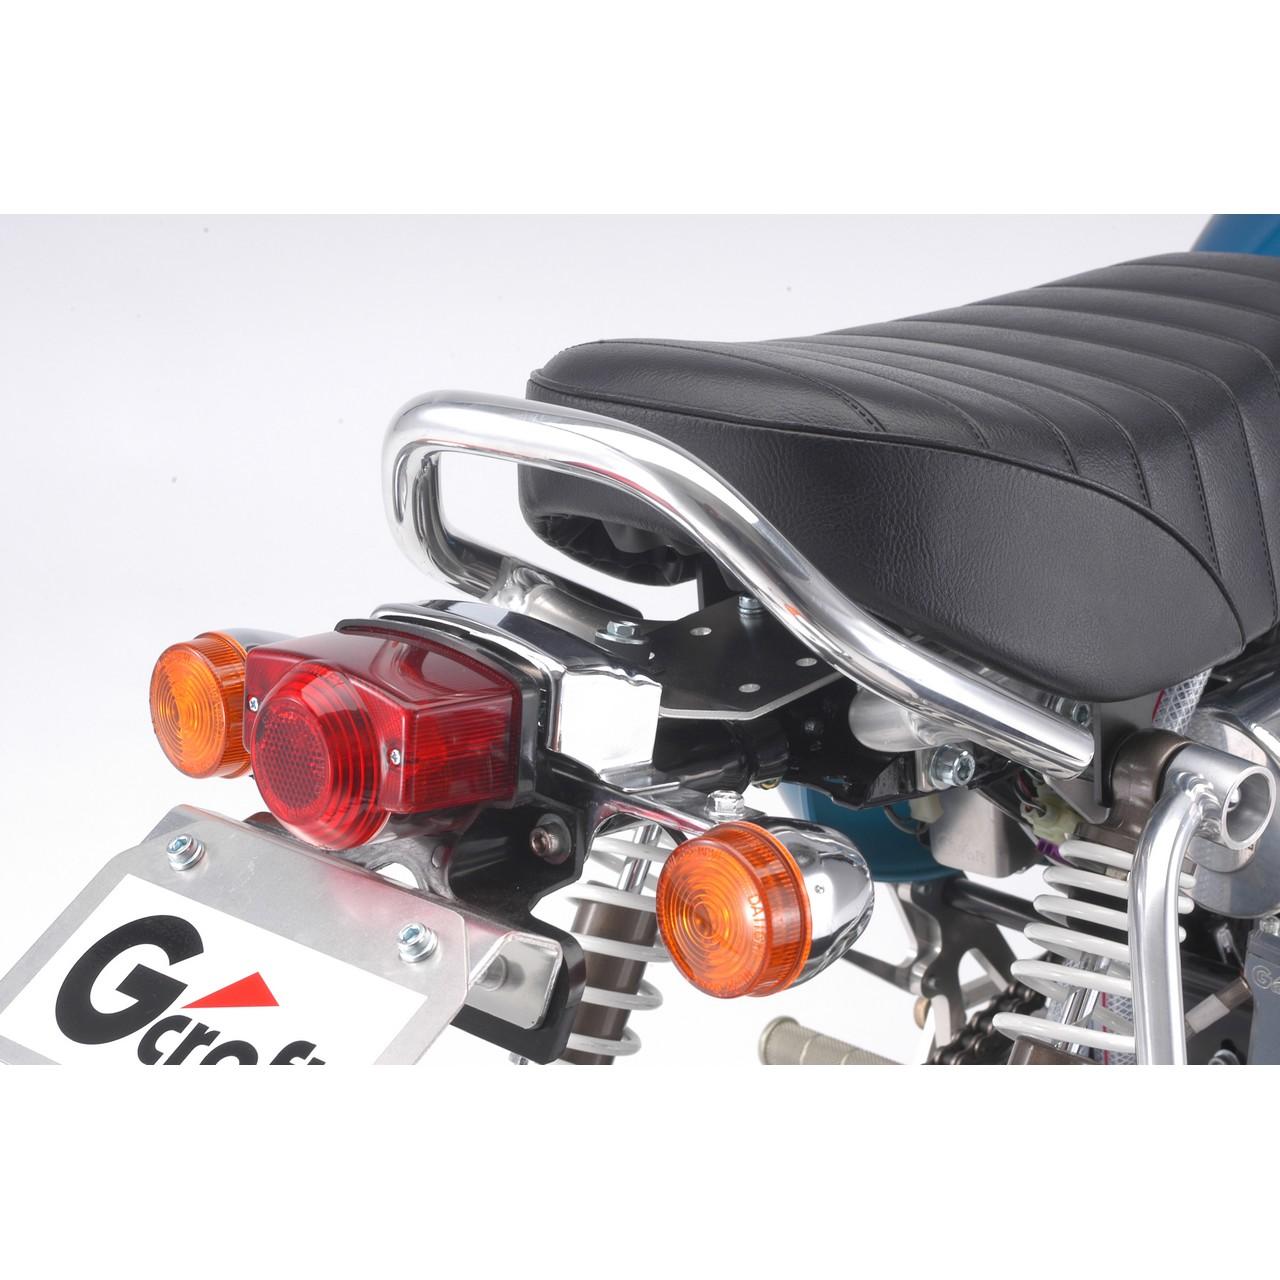 【G-Craft】可調式後扶手 - 「Webike-摩托百貨」